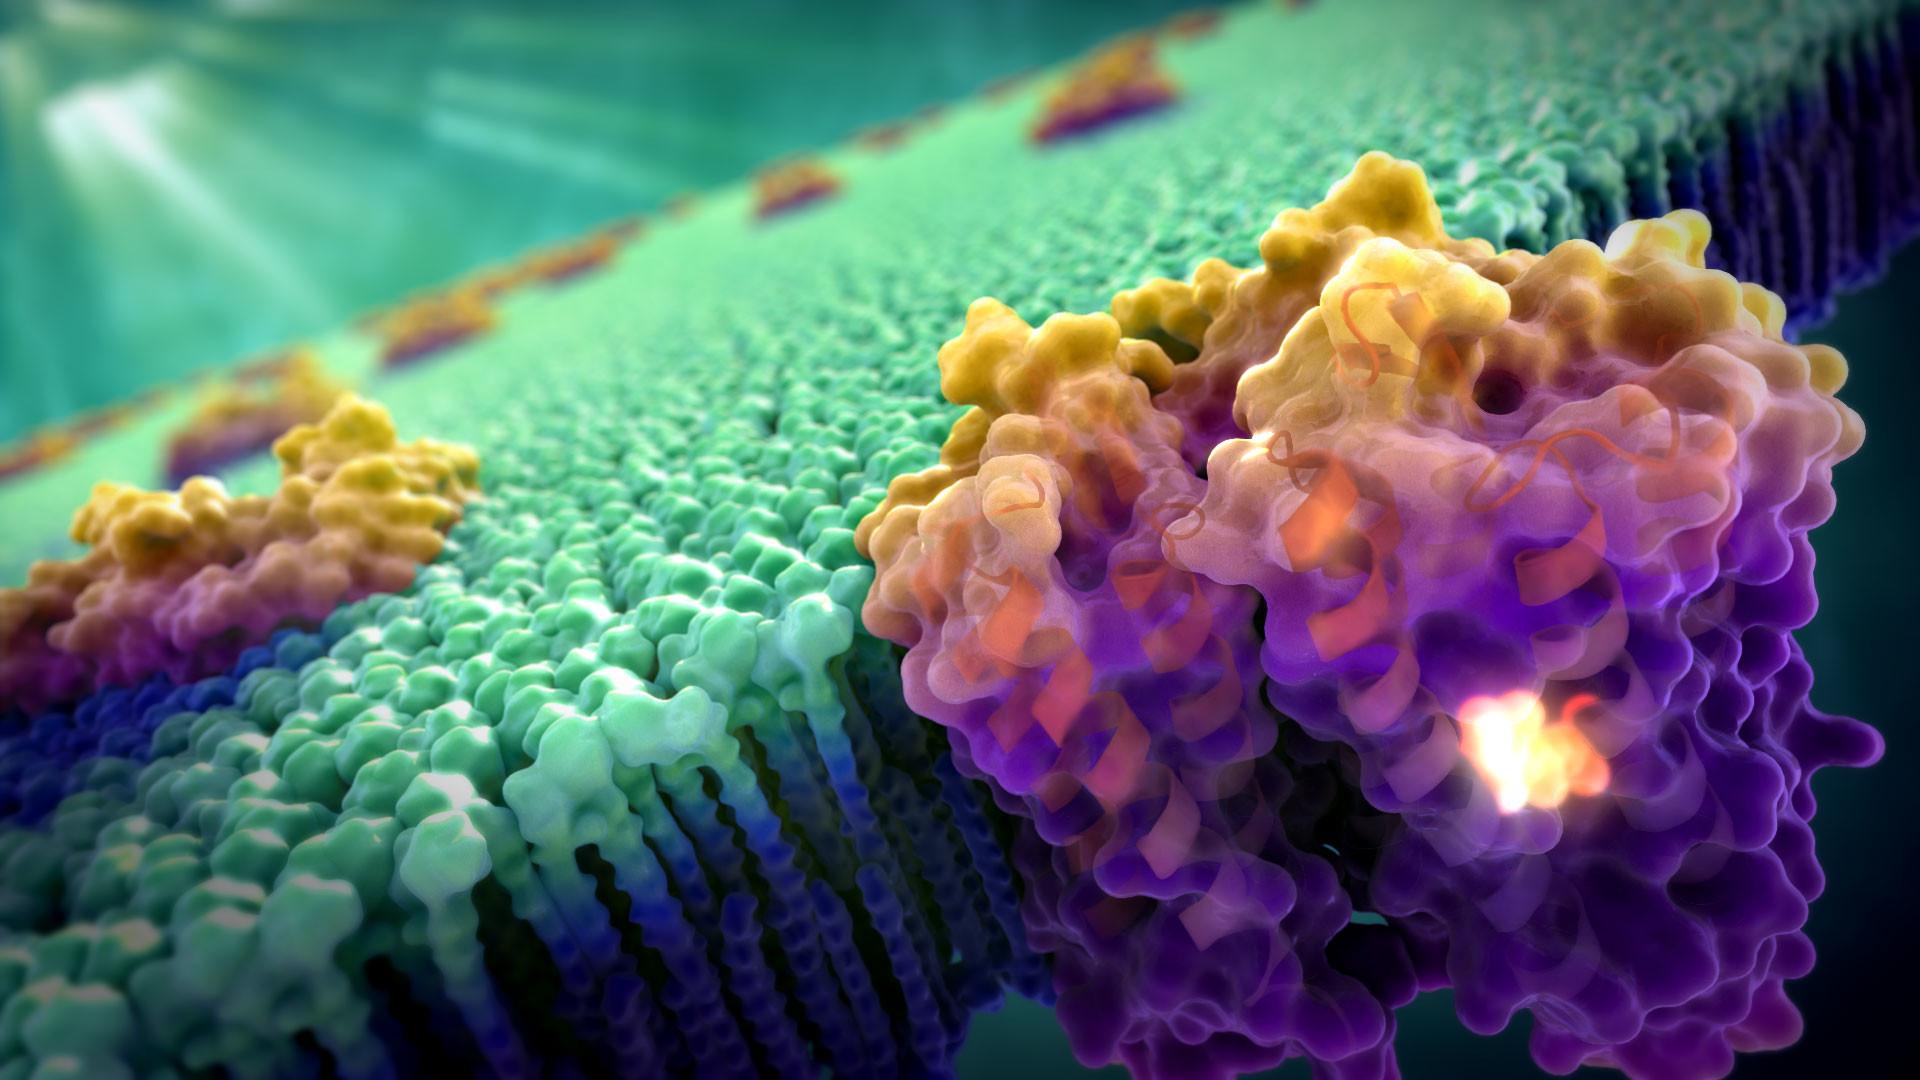 See the Light: Scientific Illustration – Medical & Scientific Video  Animation & Illustration by John Liebler